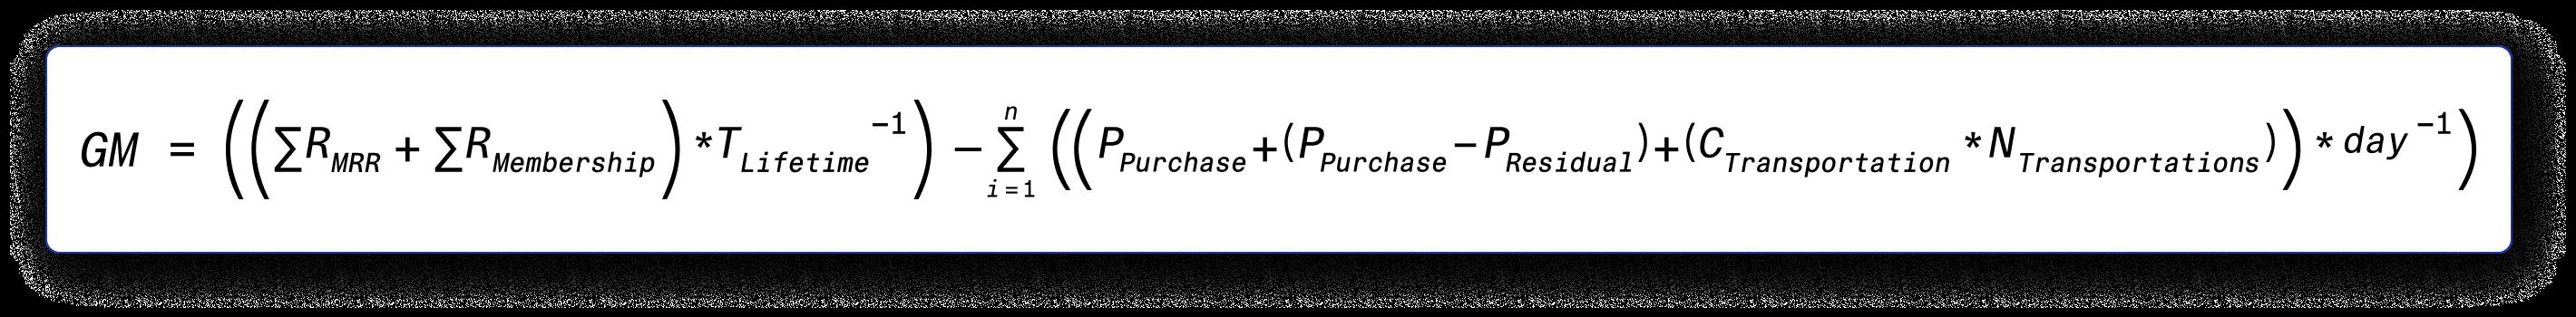 Circularity Formula